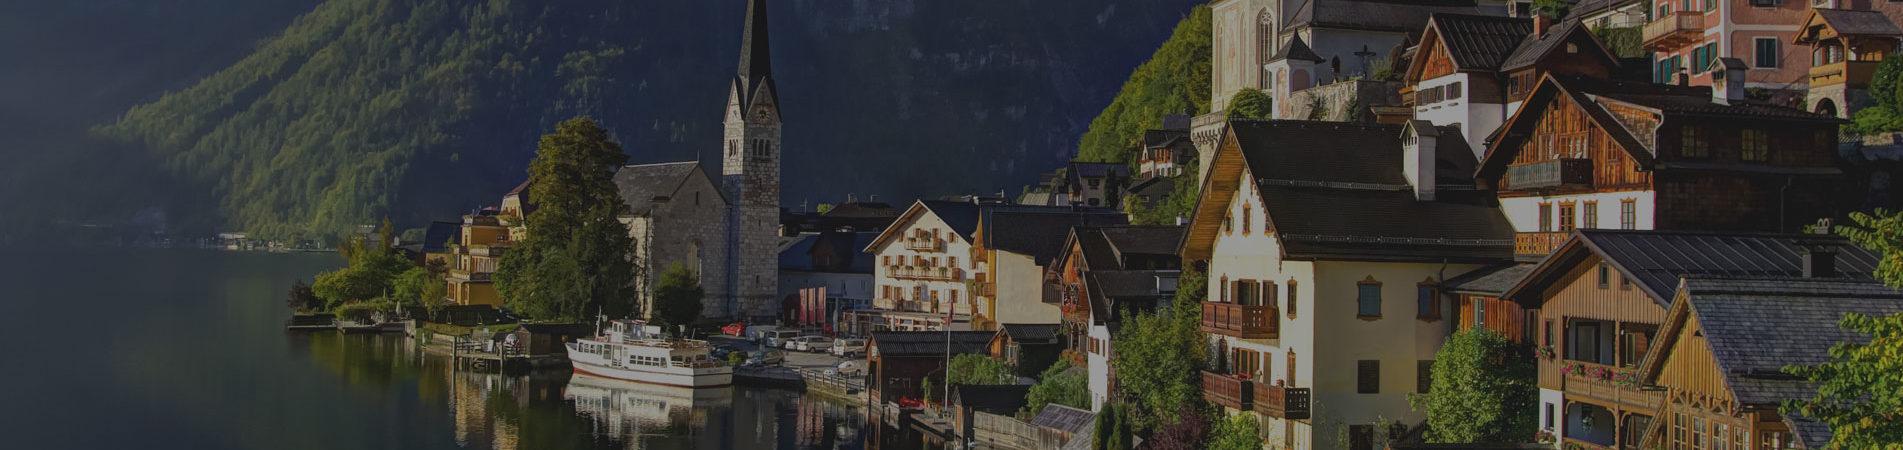 Austria Wide